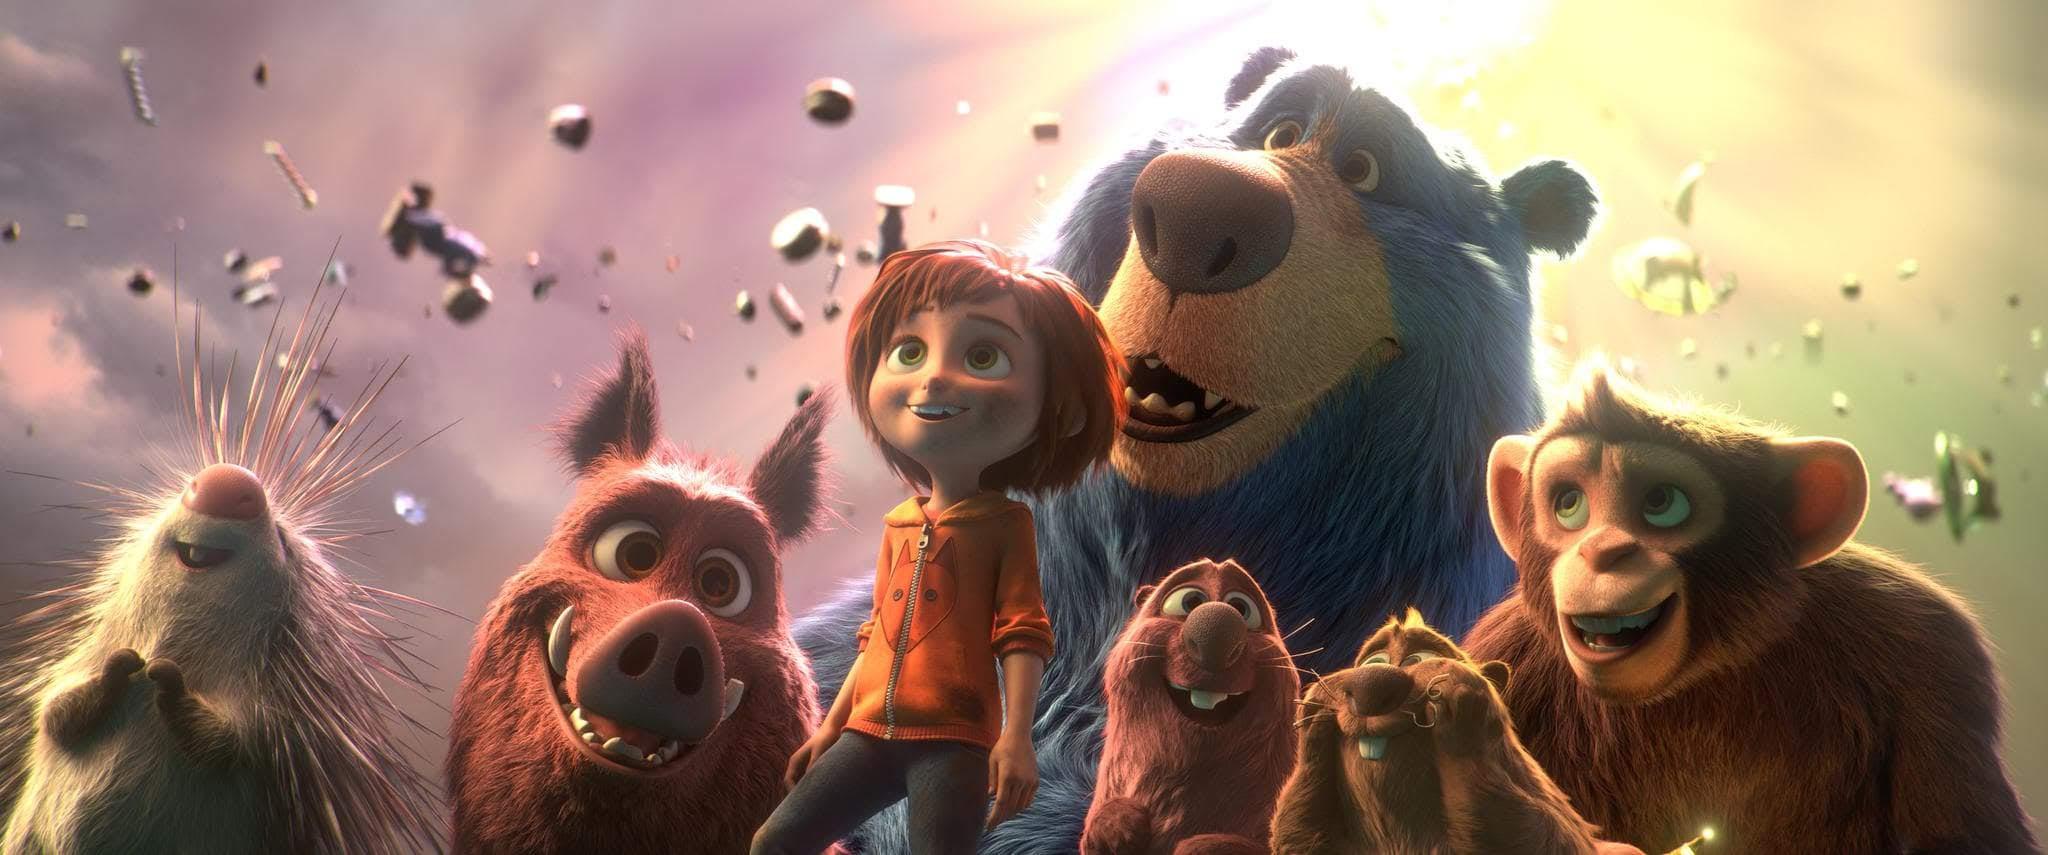 Box Office : 3月15日~17日の全米映画ボックスオフィスTOP5 - 監督がいないファミリー向けのアニメ映画「ワンダー・パーク」が、予想を上まわる封切り成績を稼いだものの、巨額の製作費には見合わず、物足りないヒットの初登場第2位 ! !